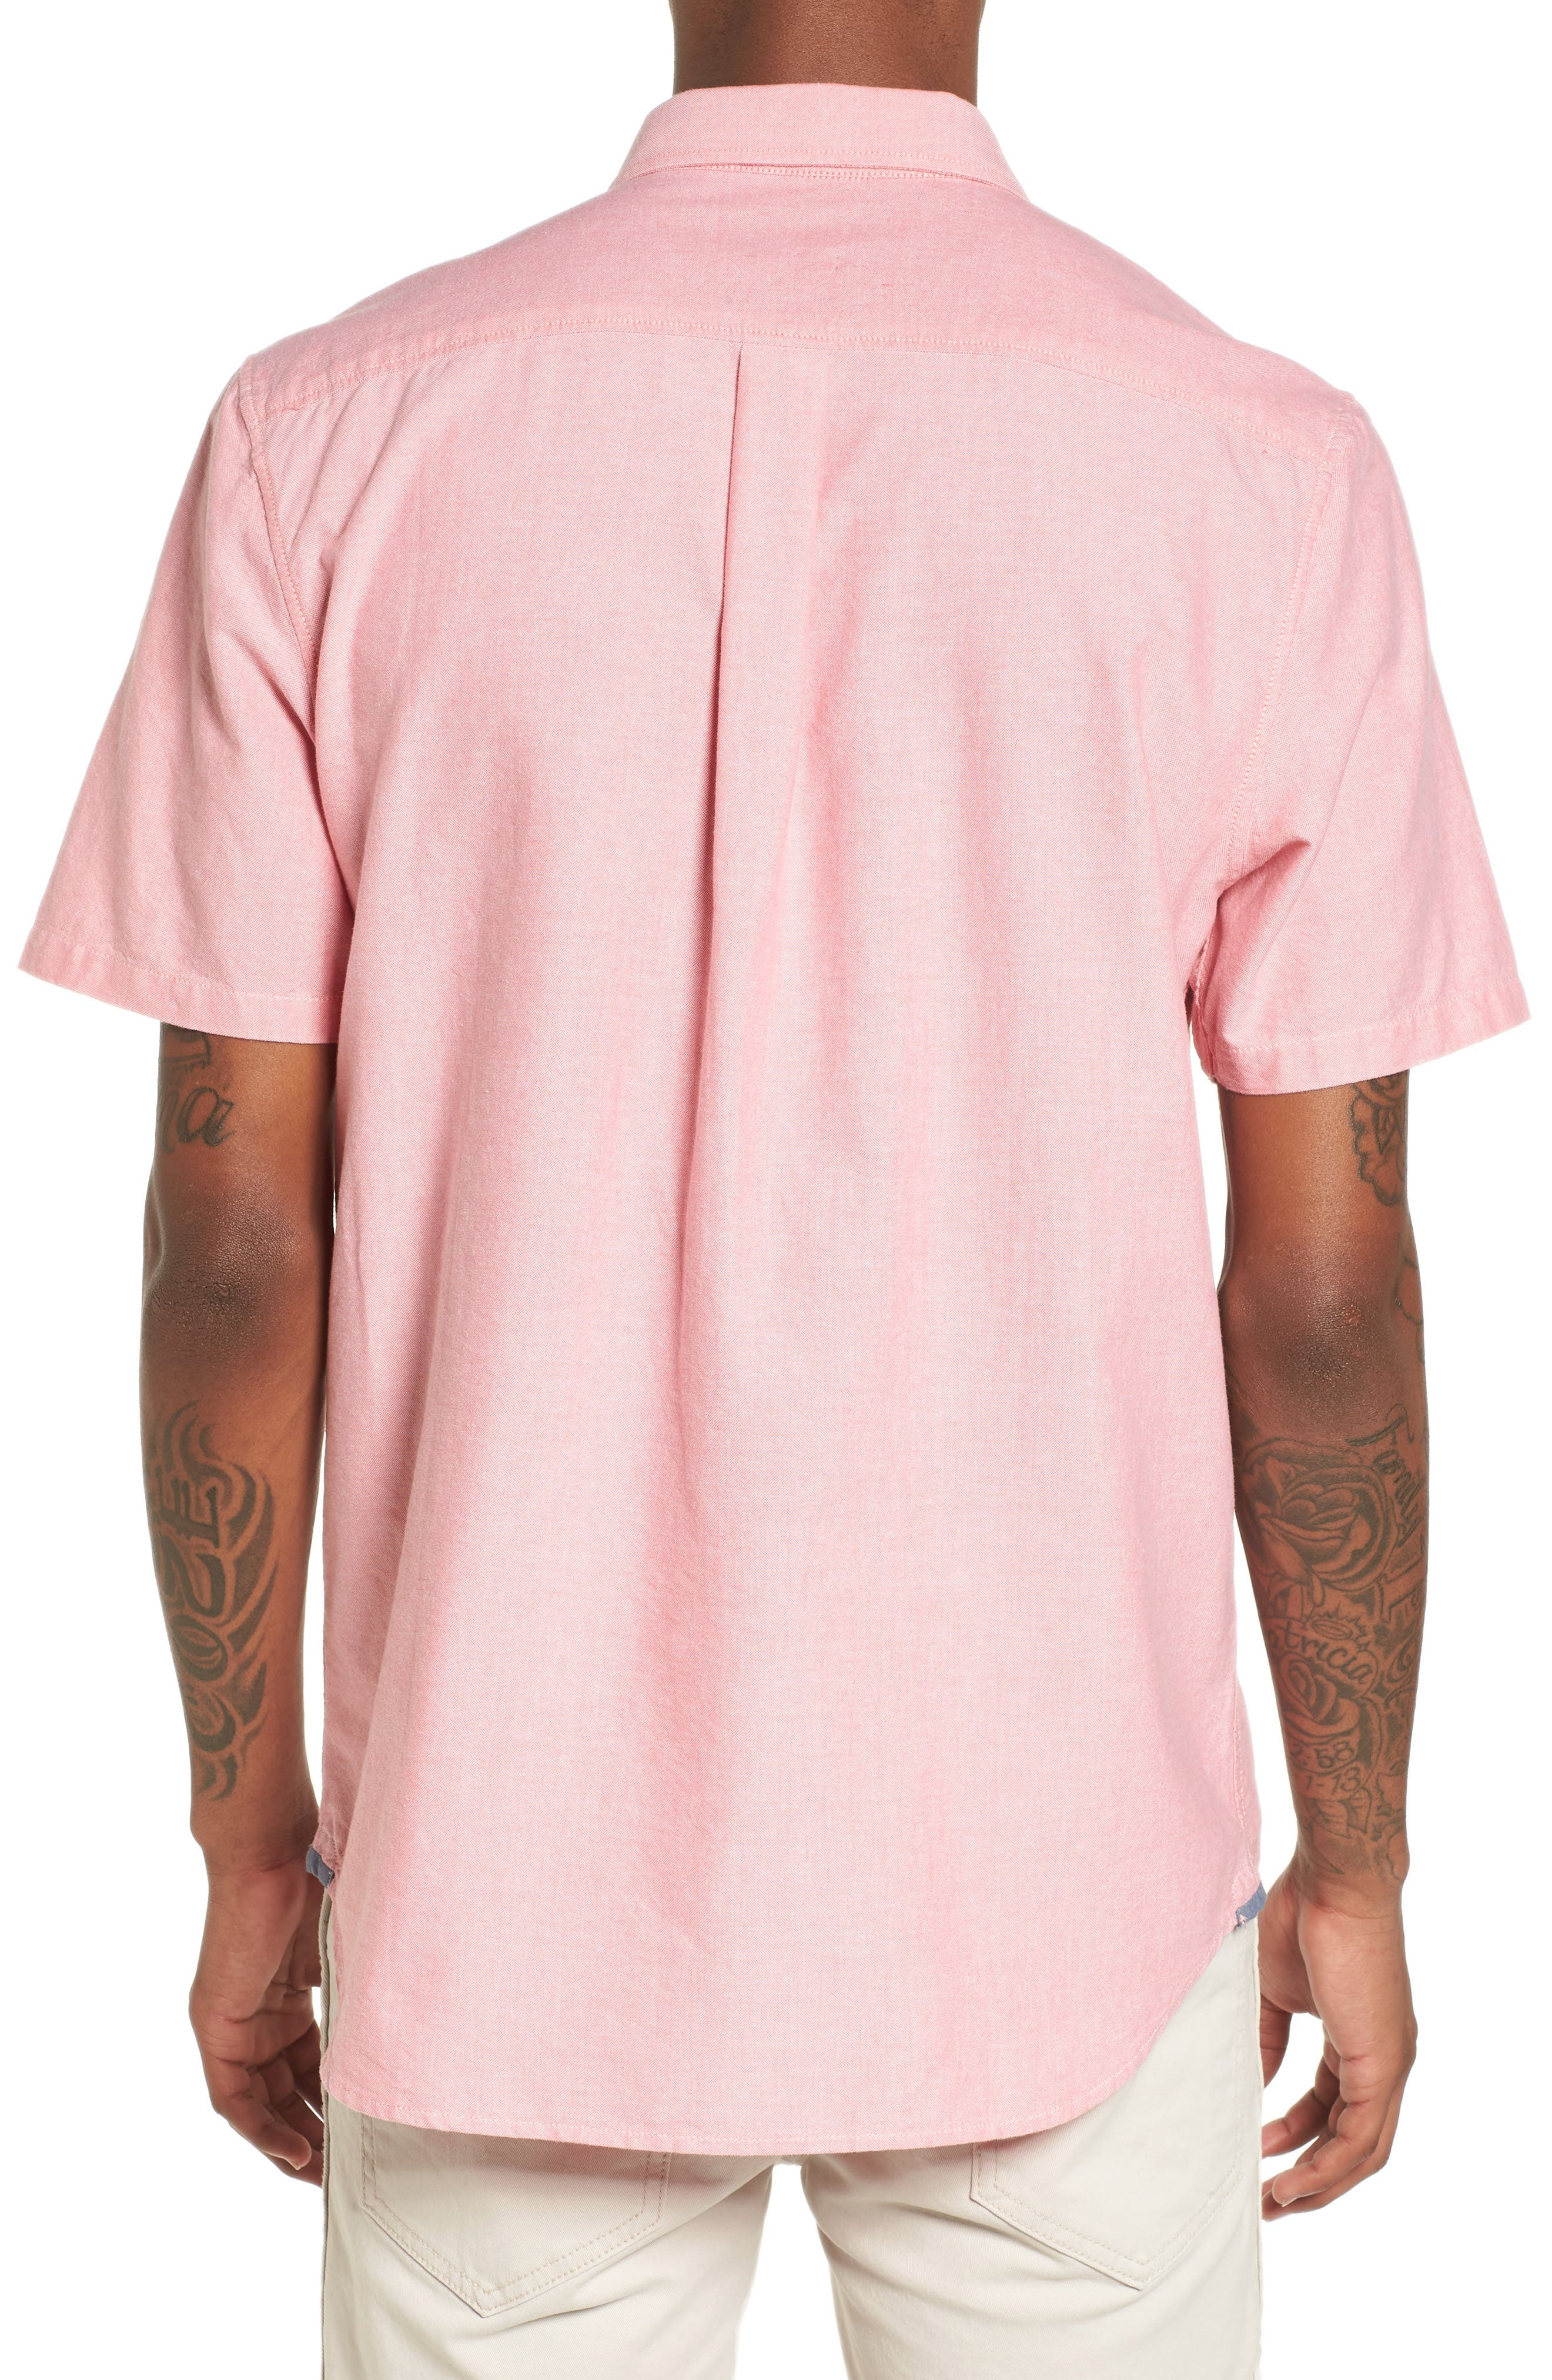 Houser Solid Woven Shirt,                             Alternate thumbnail 2, color,